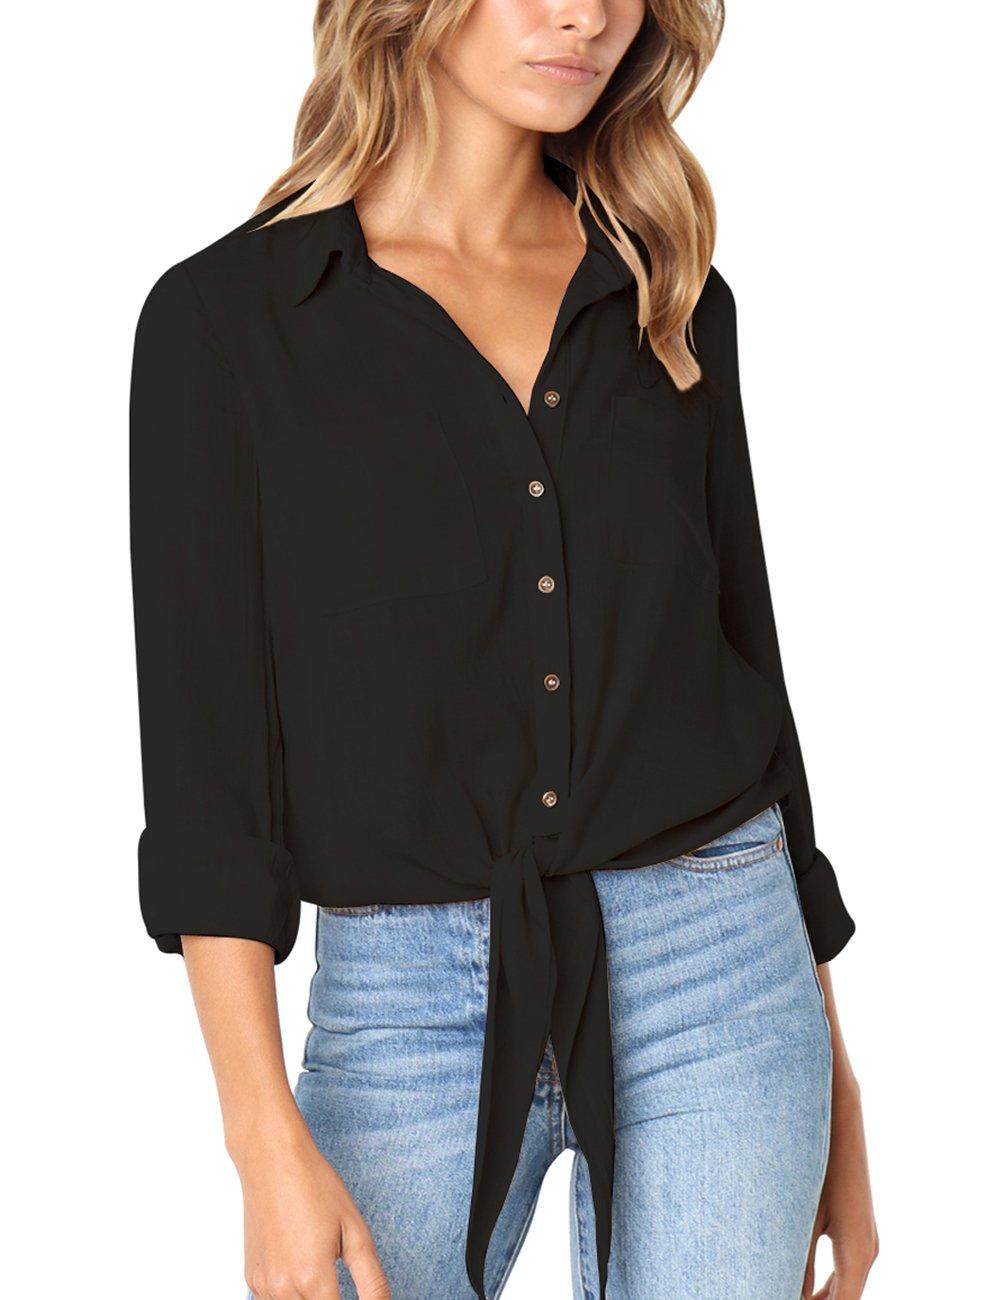 Semfri Womens Long Sleeve Button Down Tie Front Shirt Chest Pocket V Neck Blouse Tops(M,Black)